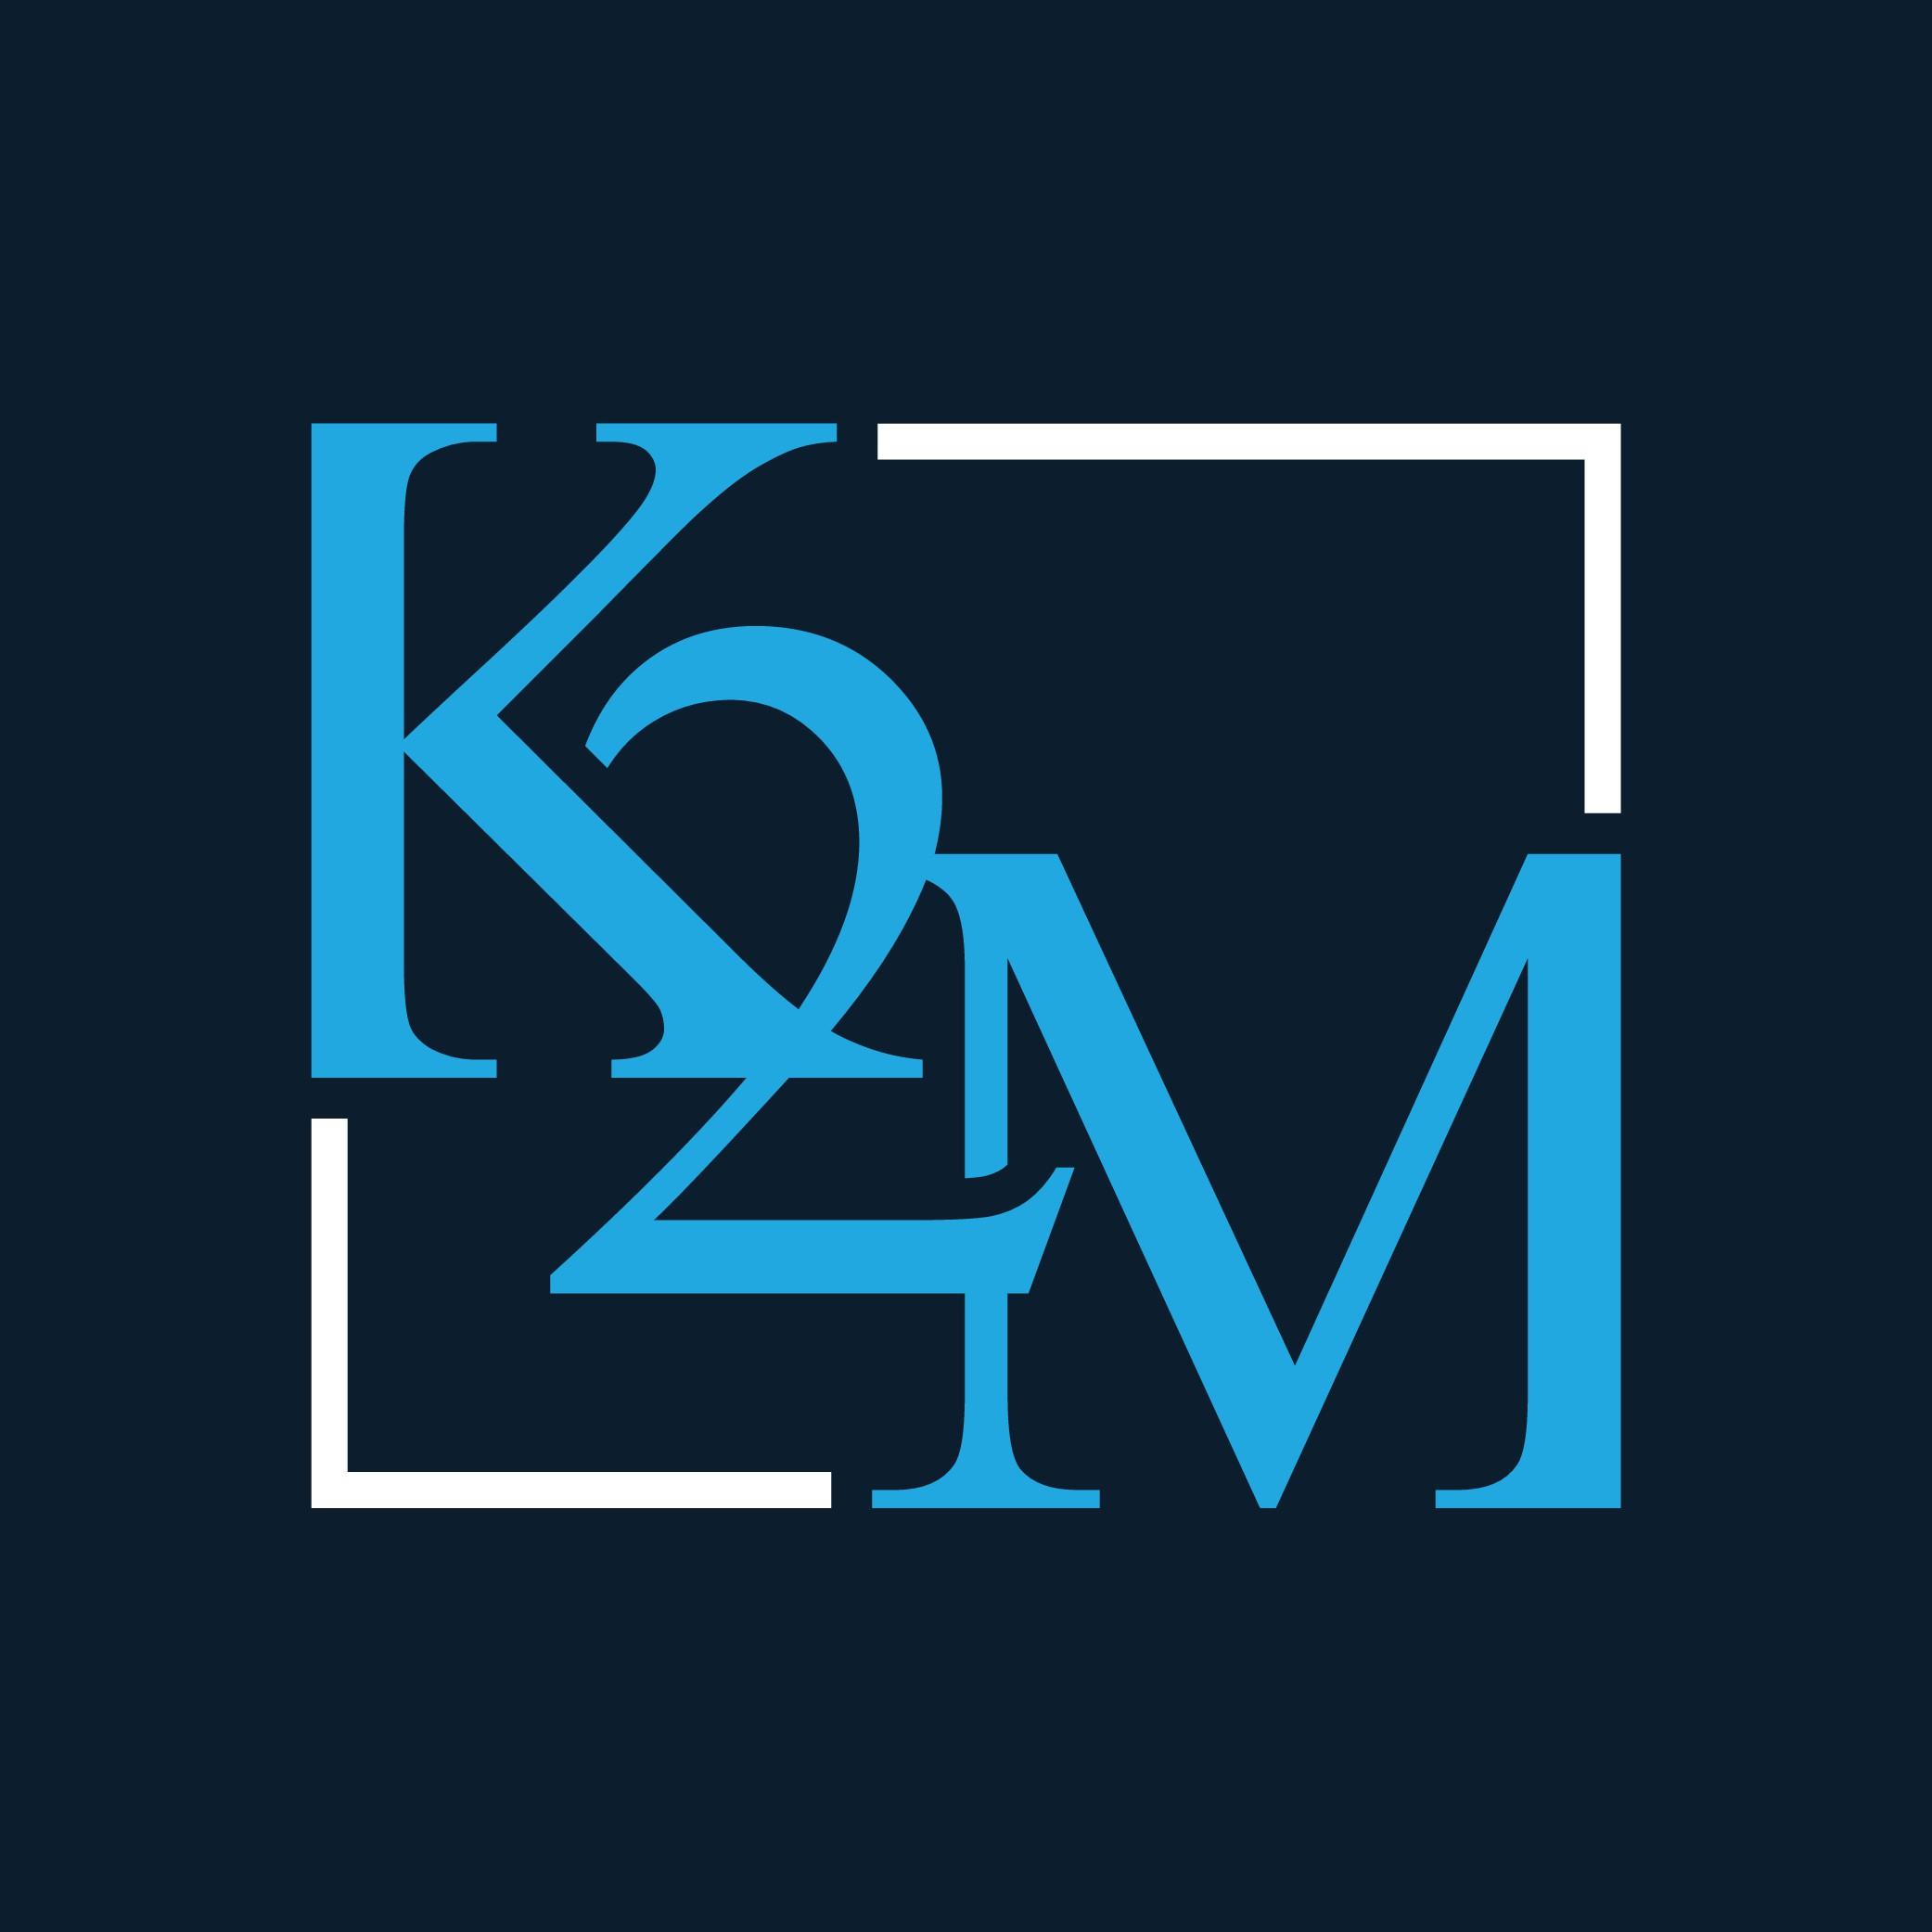 Commercial real estate developer needs a fresh logo! No housing, leave out llc